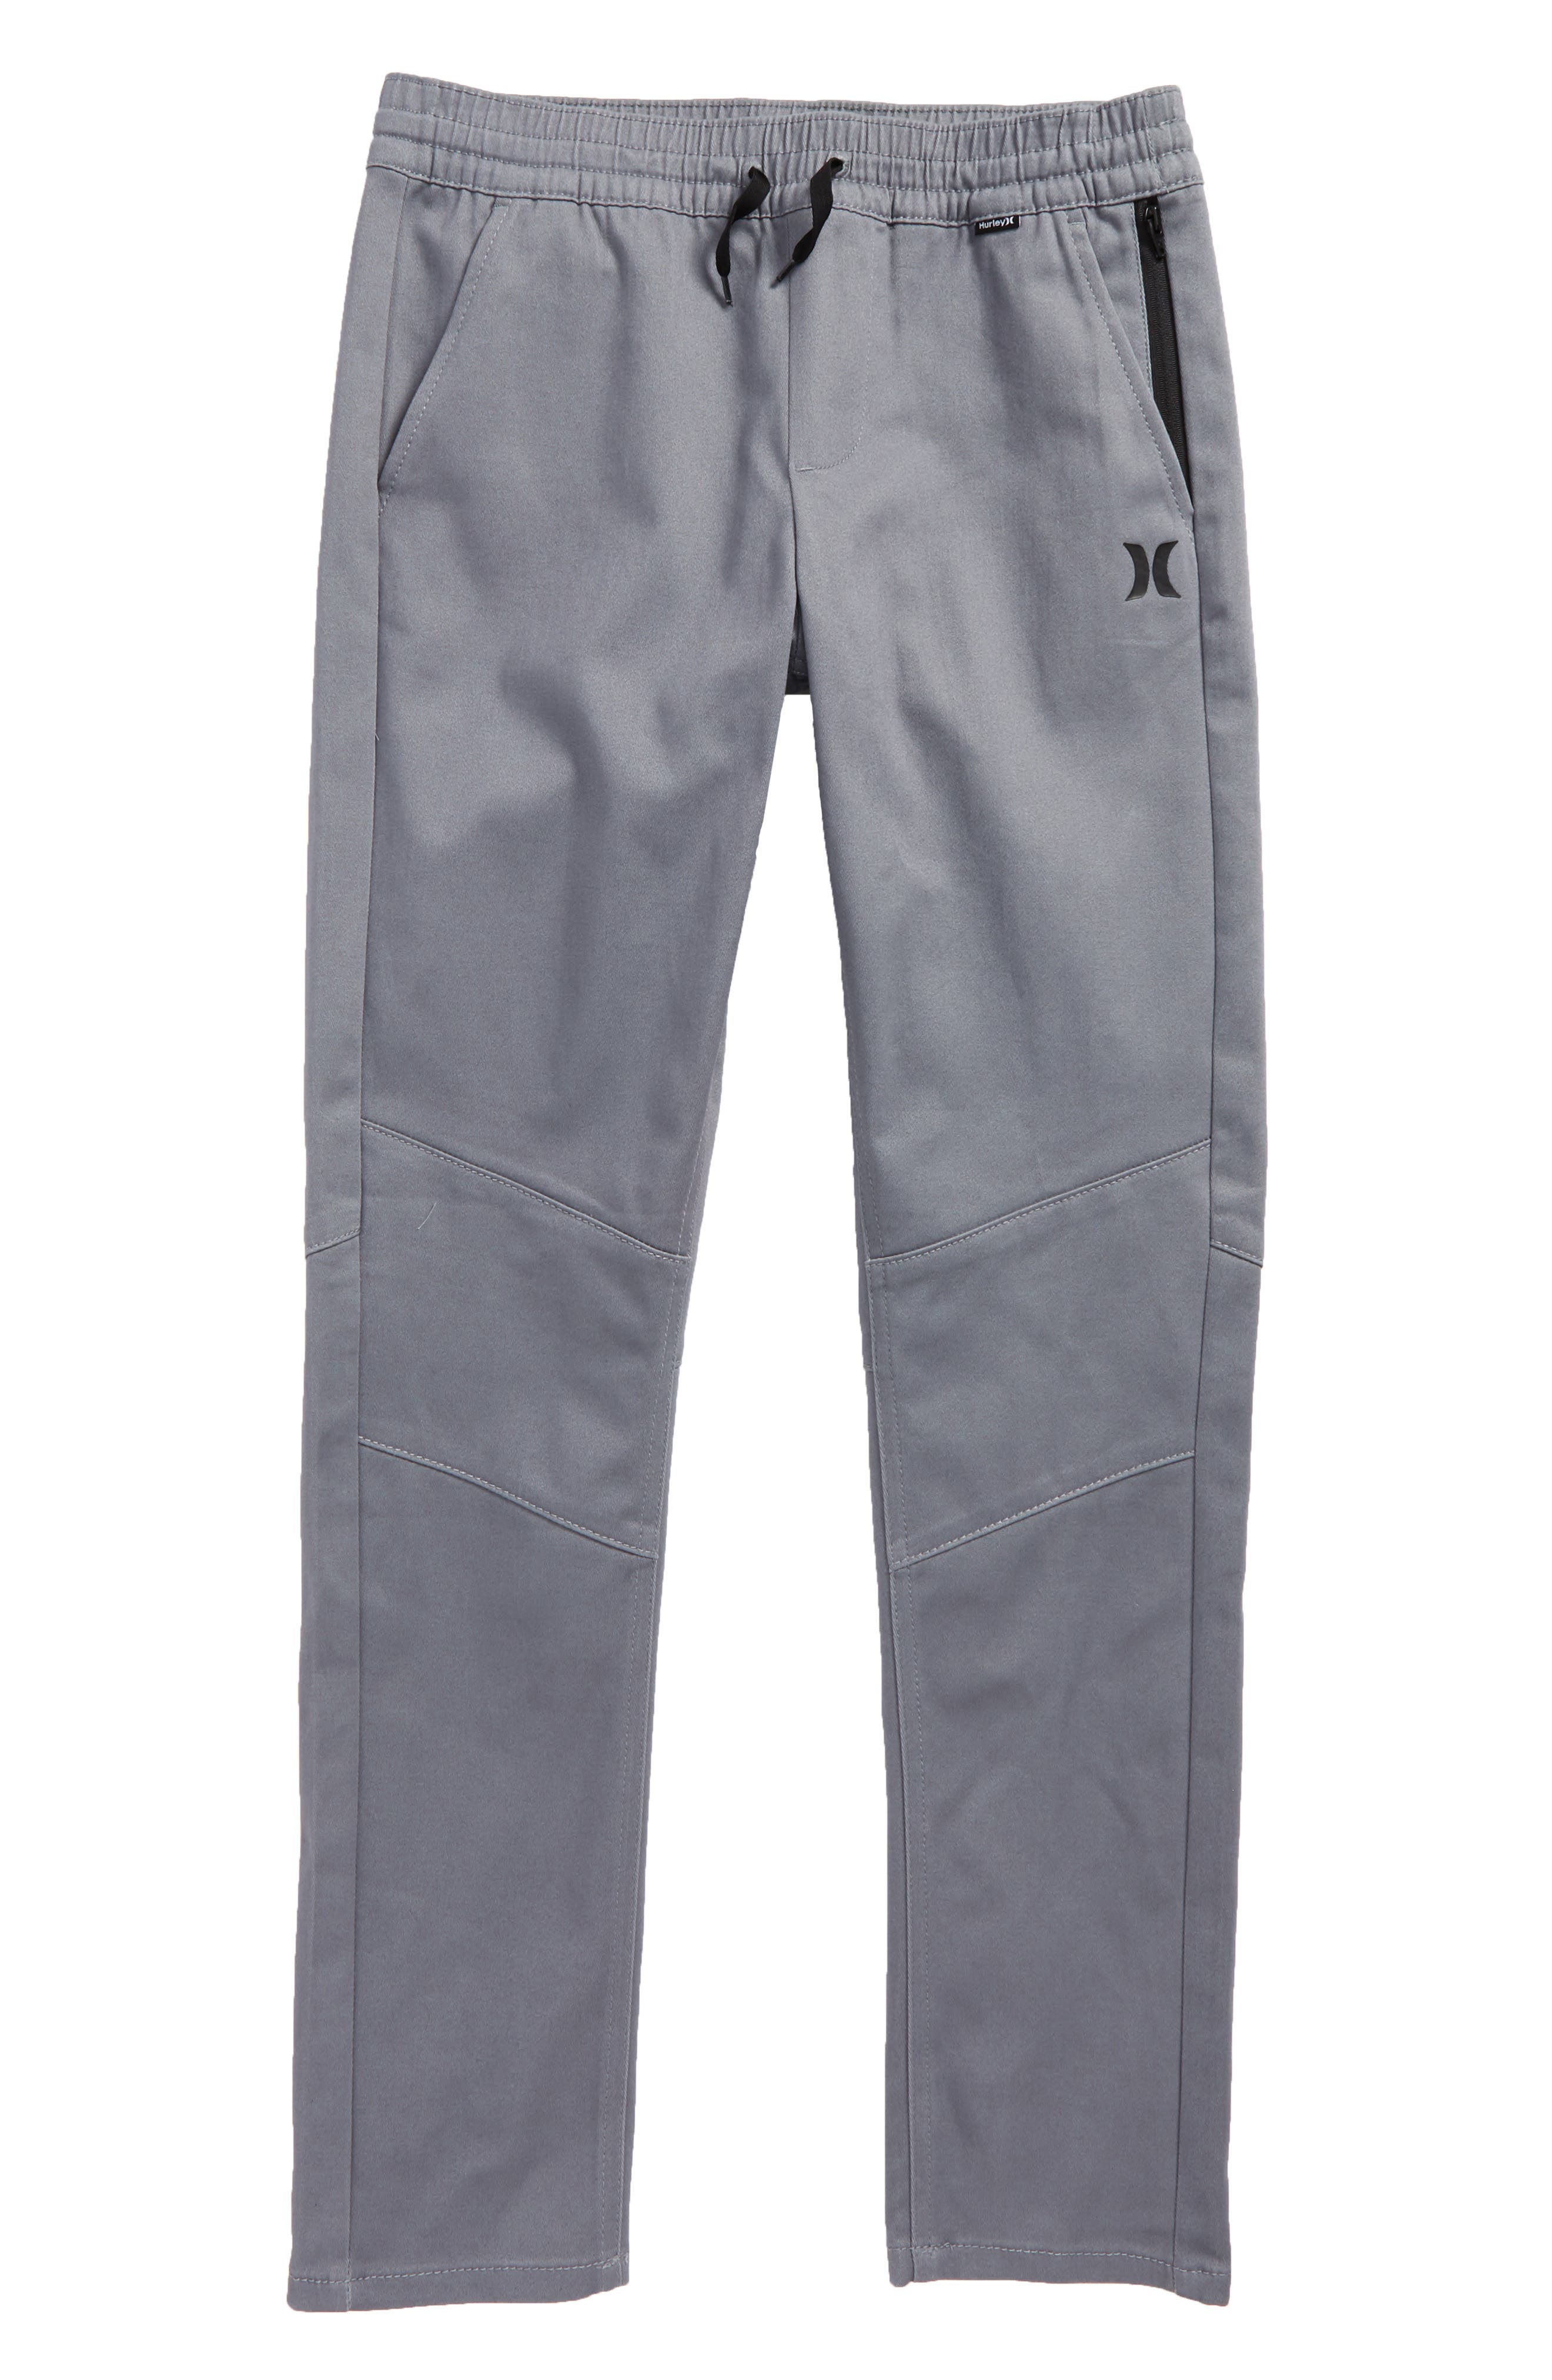 Alternate Image 1 Selected - Hurley Dri-FIT Tapered Track Pants (Big Boys)